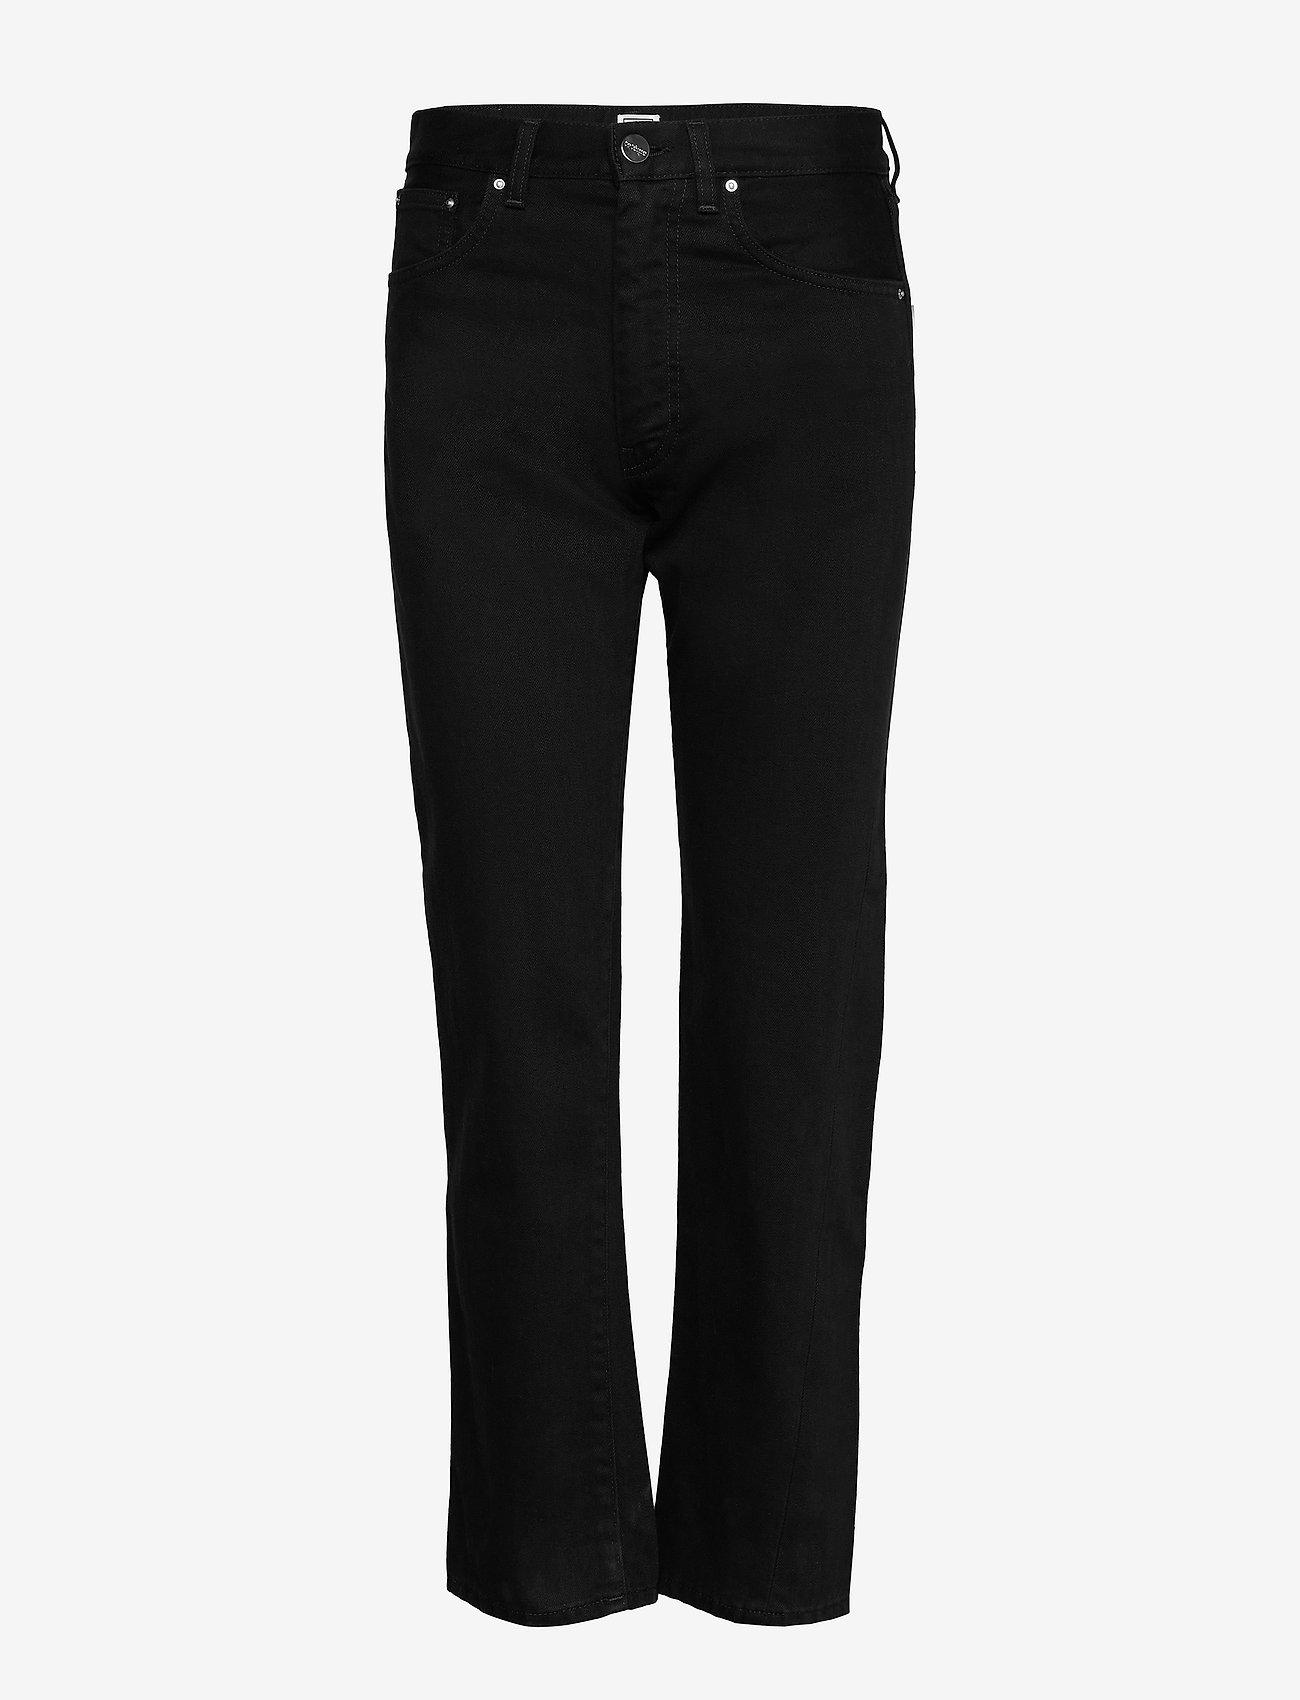 Totême - ORIGINAL DENIM - straight jeans - black rinse 290 - 0